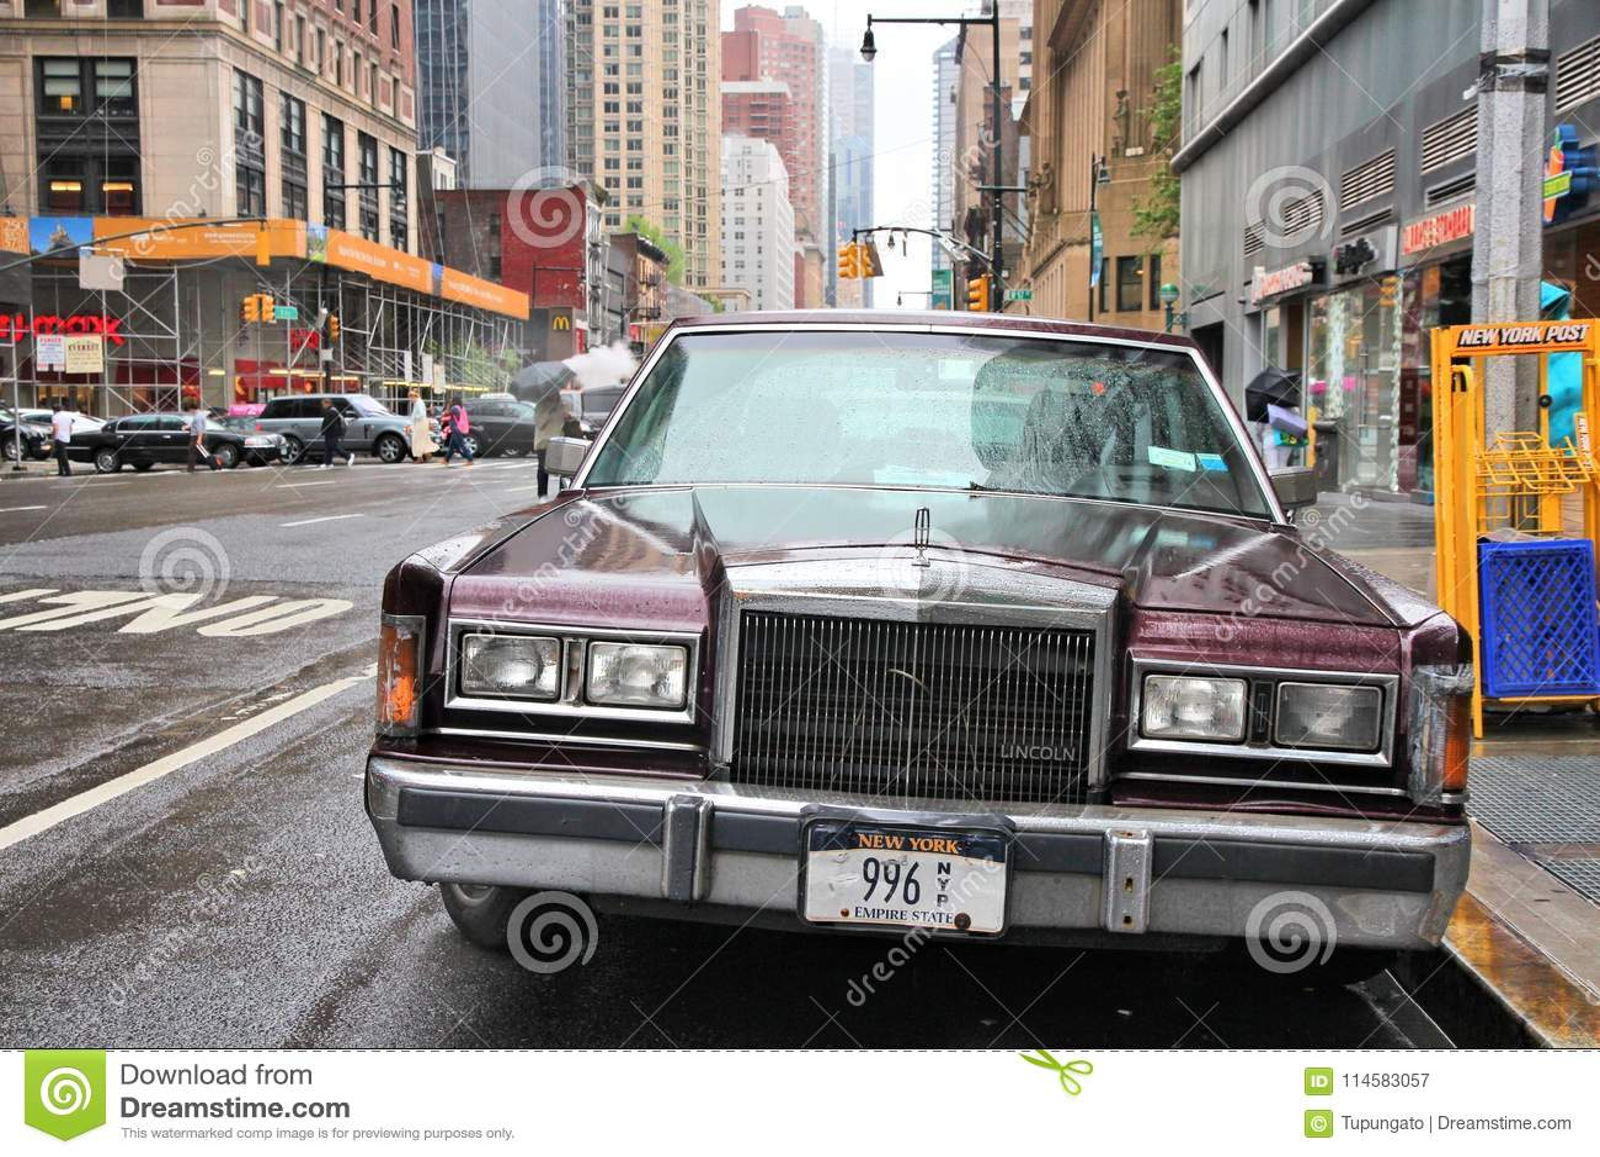 New York Car Editorial Photography Image Of Manhattan 114583057